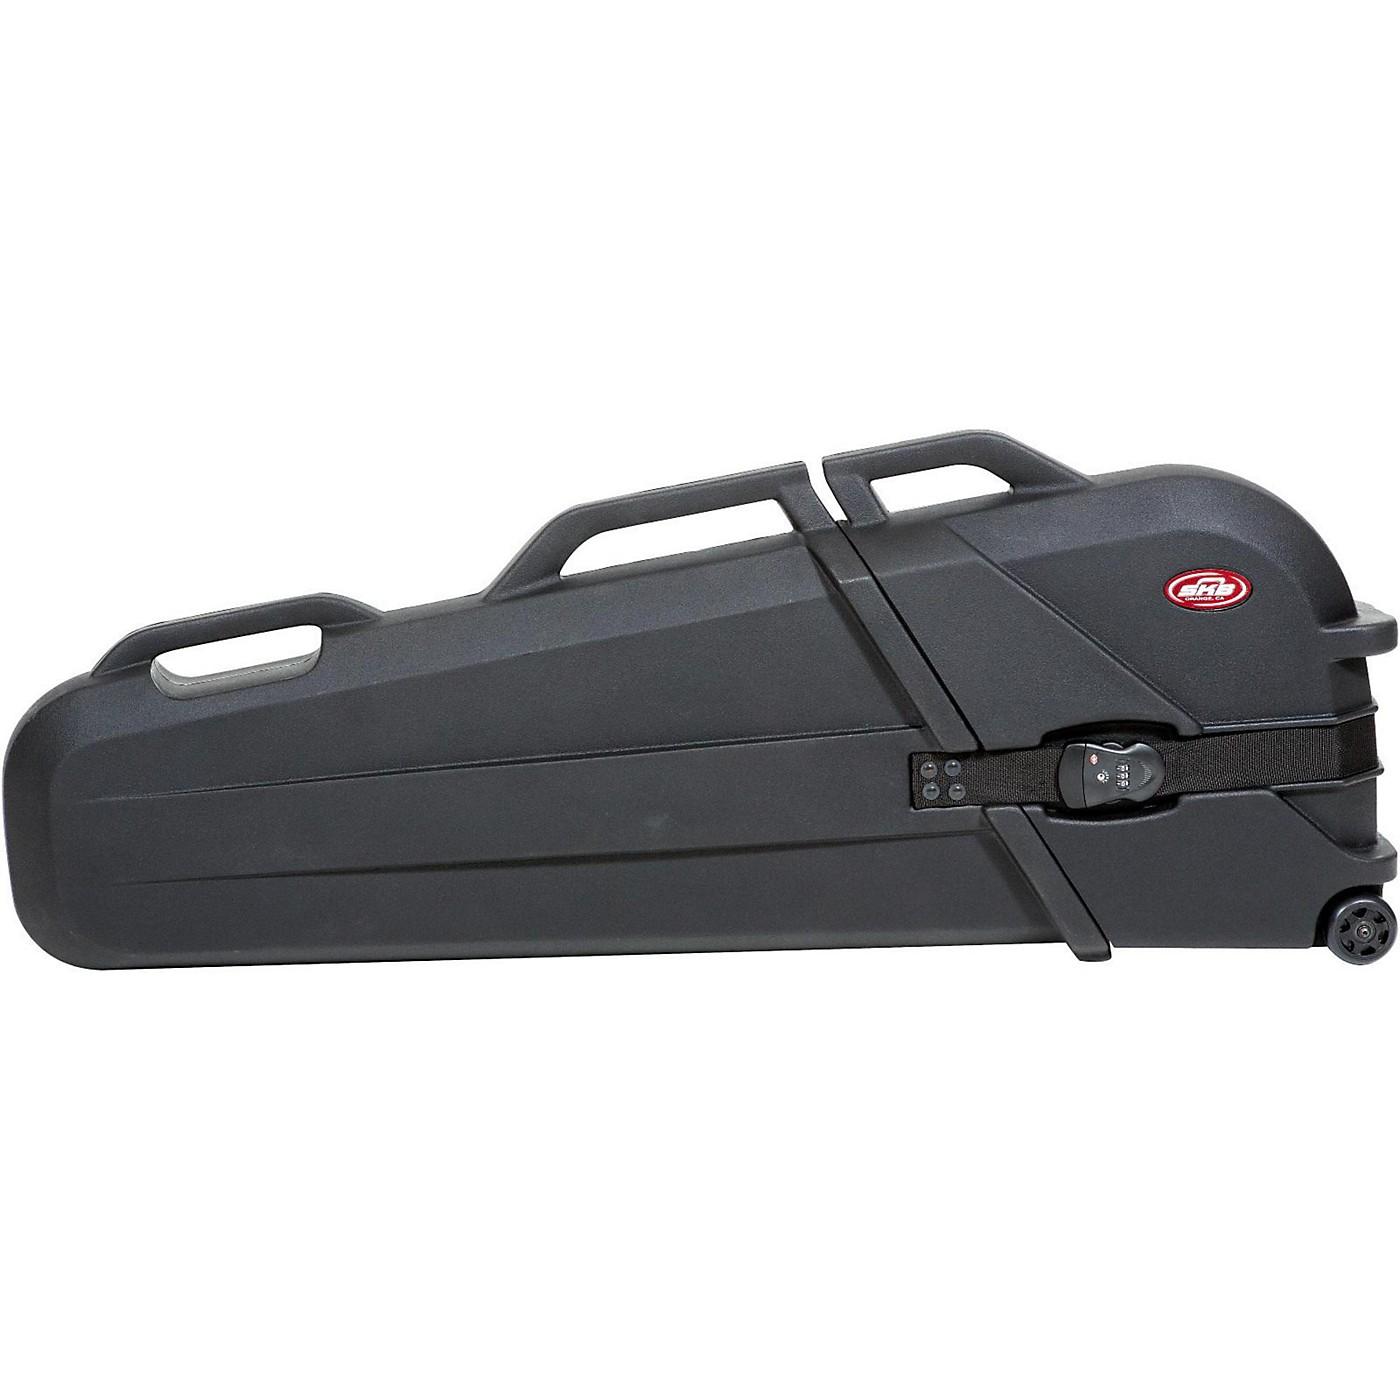 SKB SKB-44RW ATA Electric Bass Roller Case thumbnail